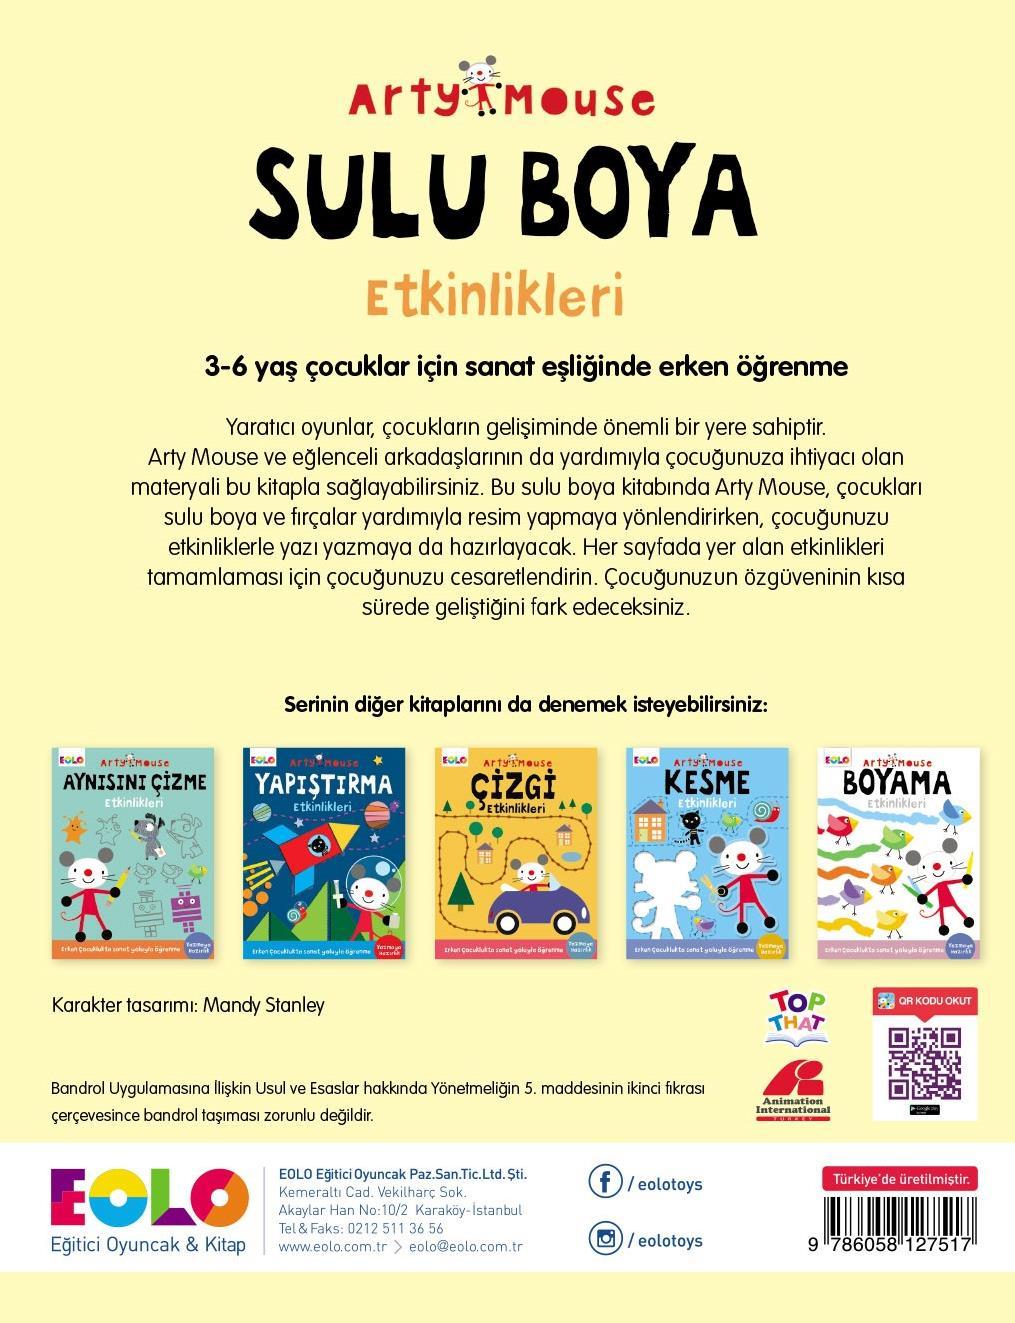 Eolo Arty Mouse Sulu Boya Etkinlikleri Akil Akademi